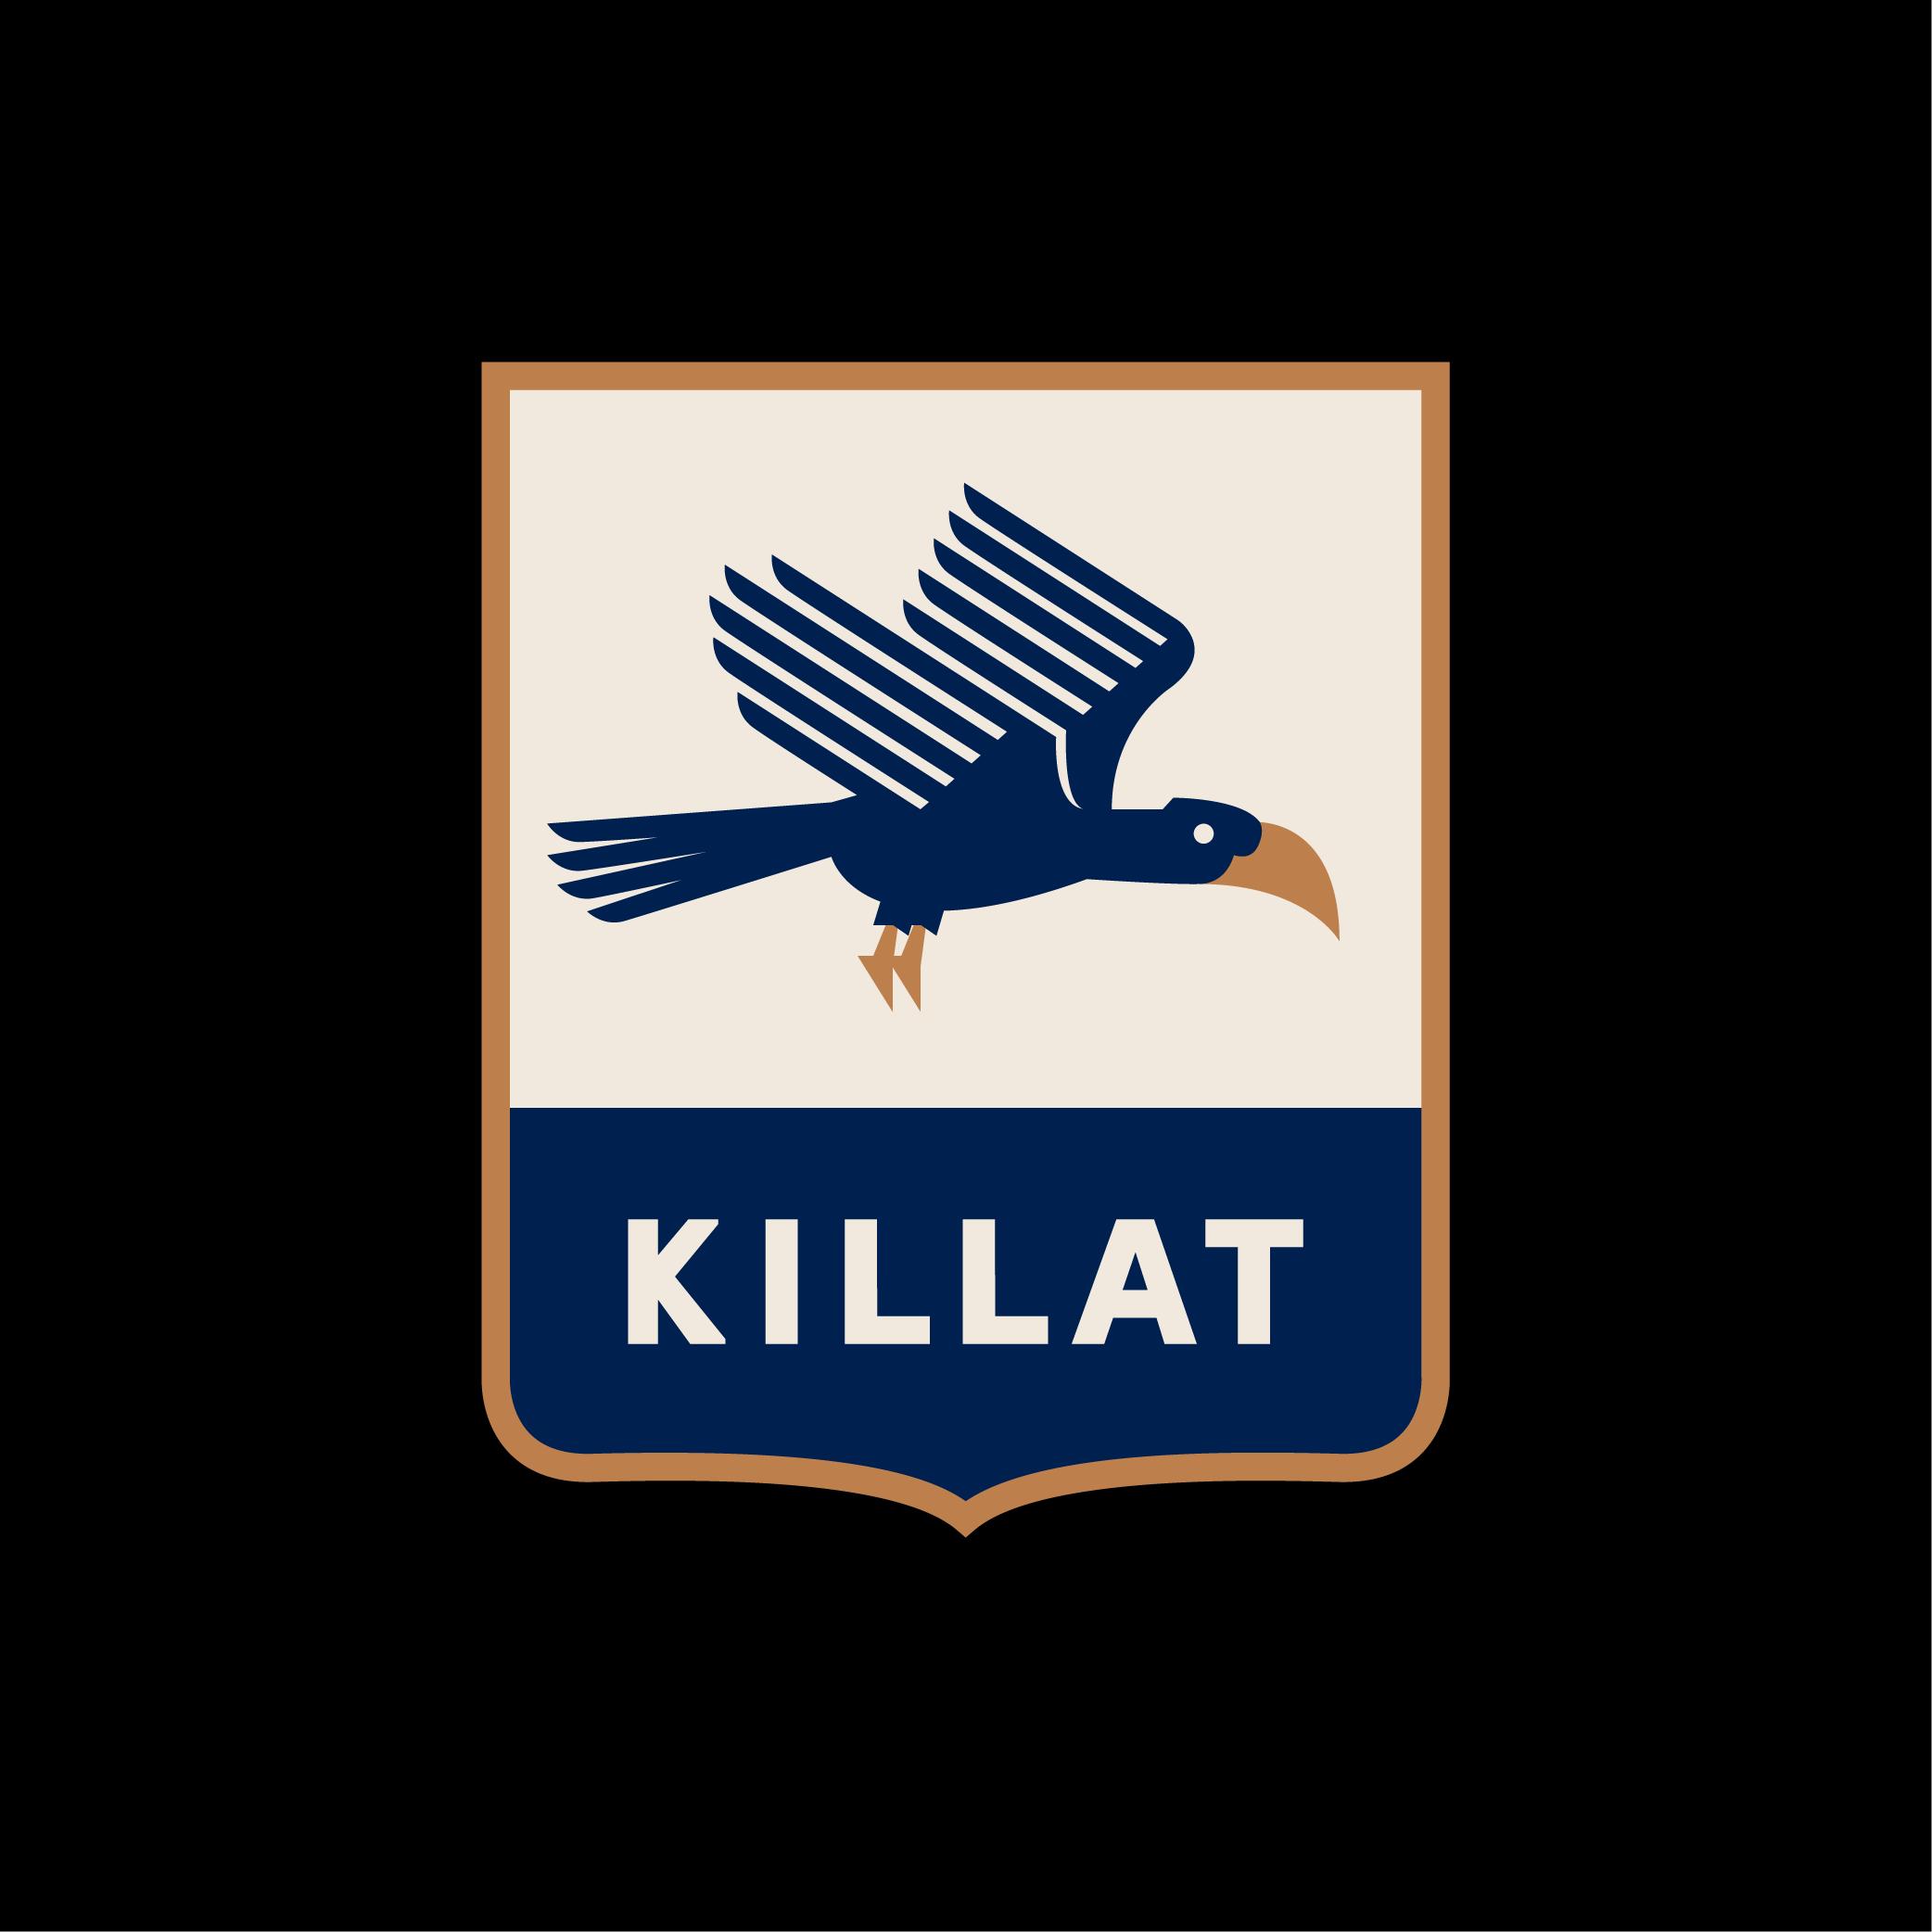 KILLAT